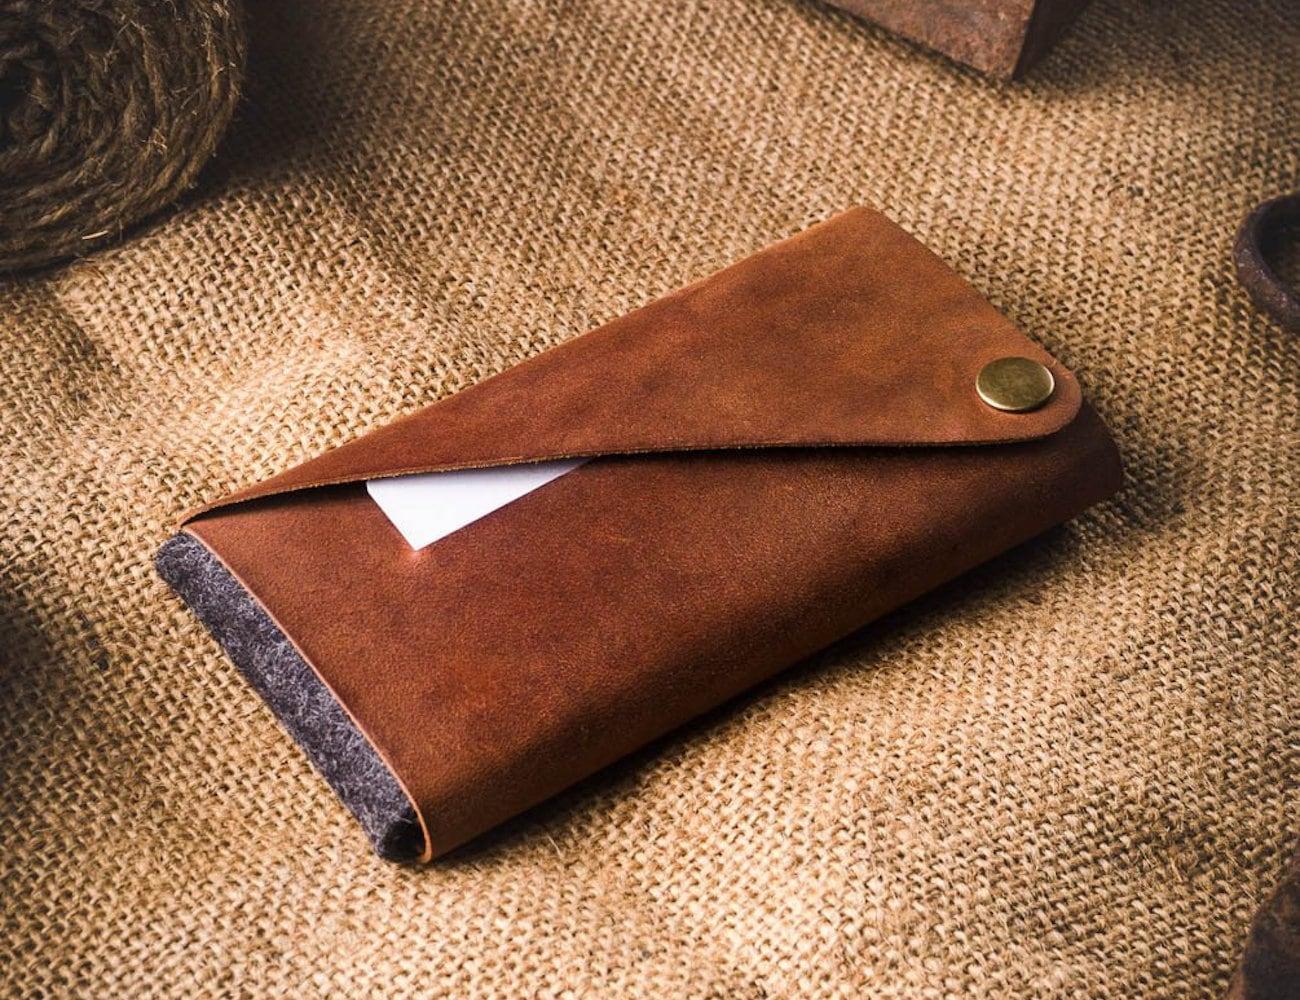 CrazyHorseCraft Foldable Leather iPhone Wallet